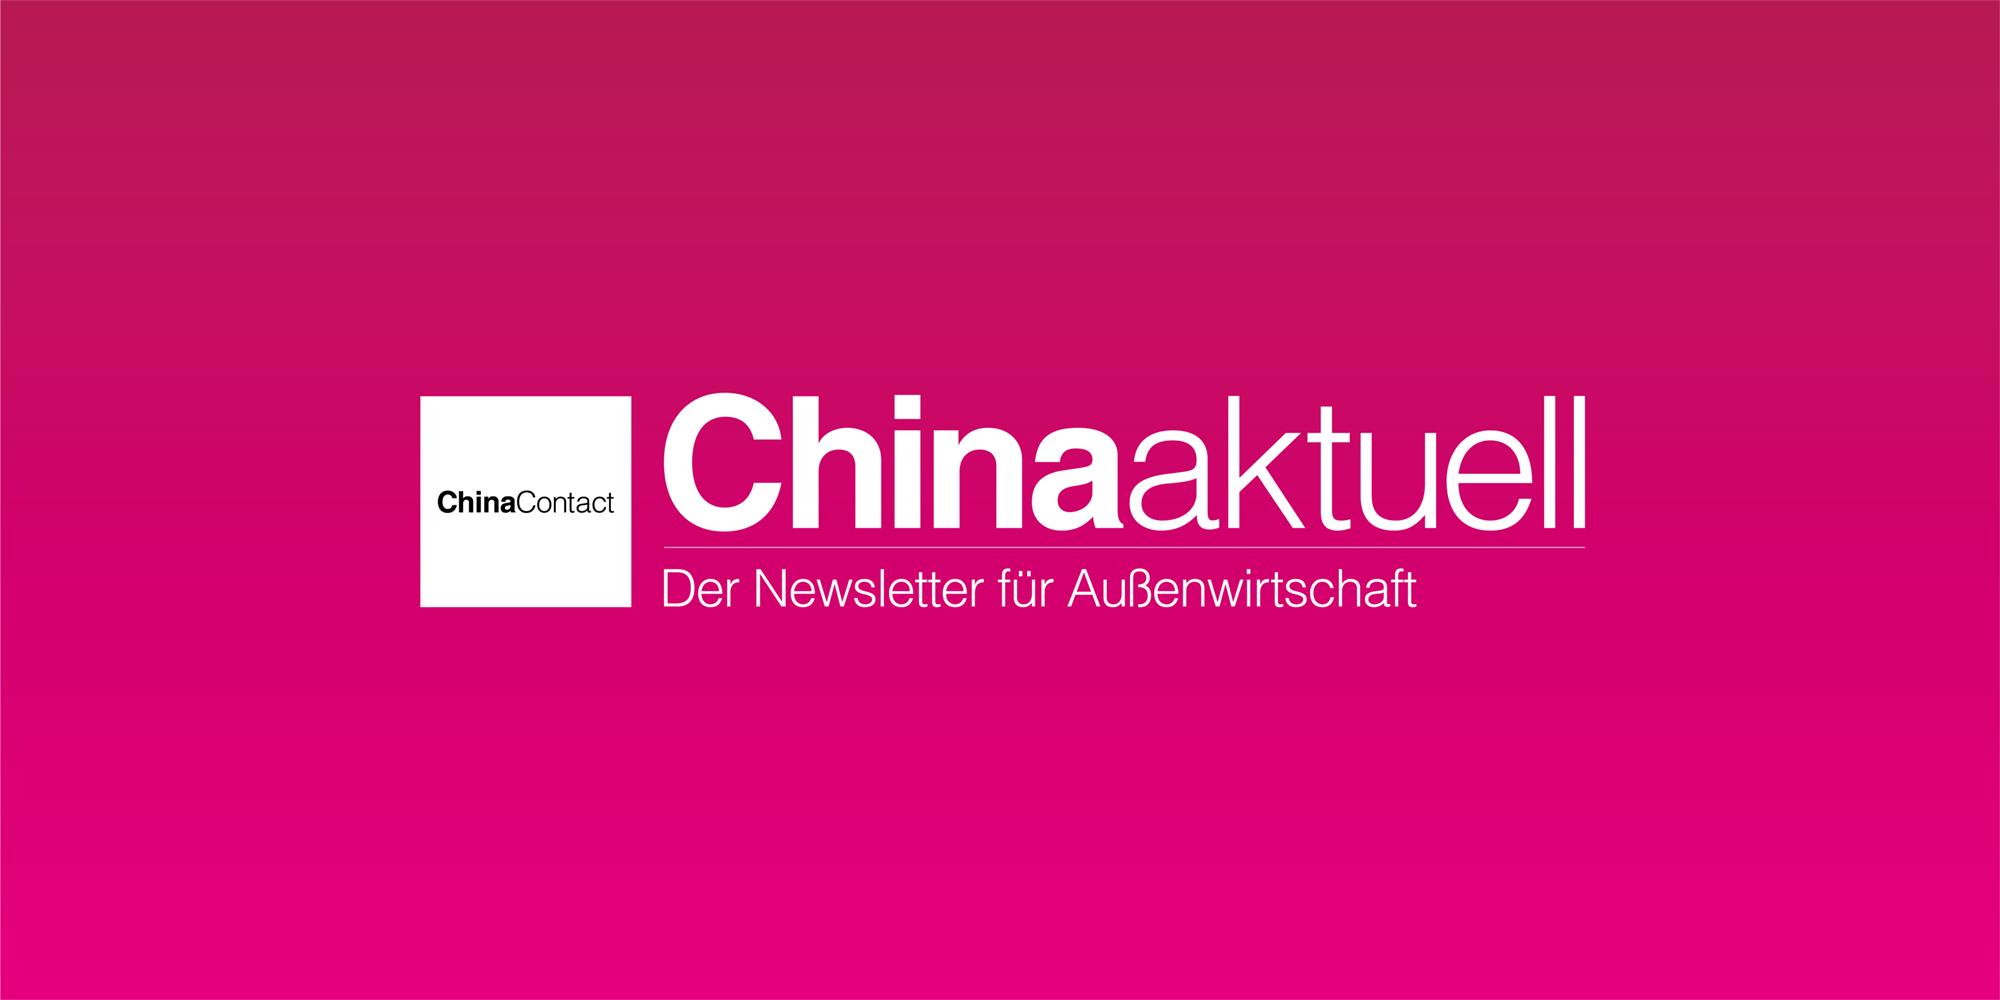 https://owc.de/wp-content/uploads/2020/07/c-aktuell-web-2020.jpg